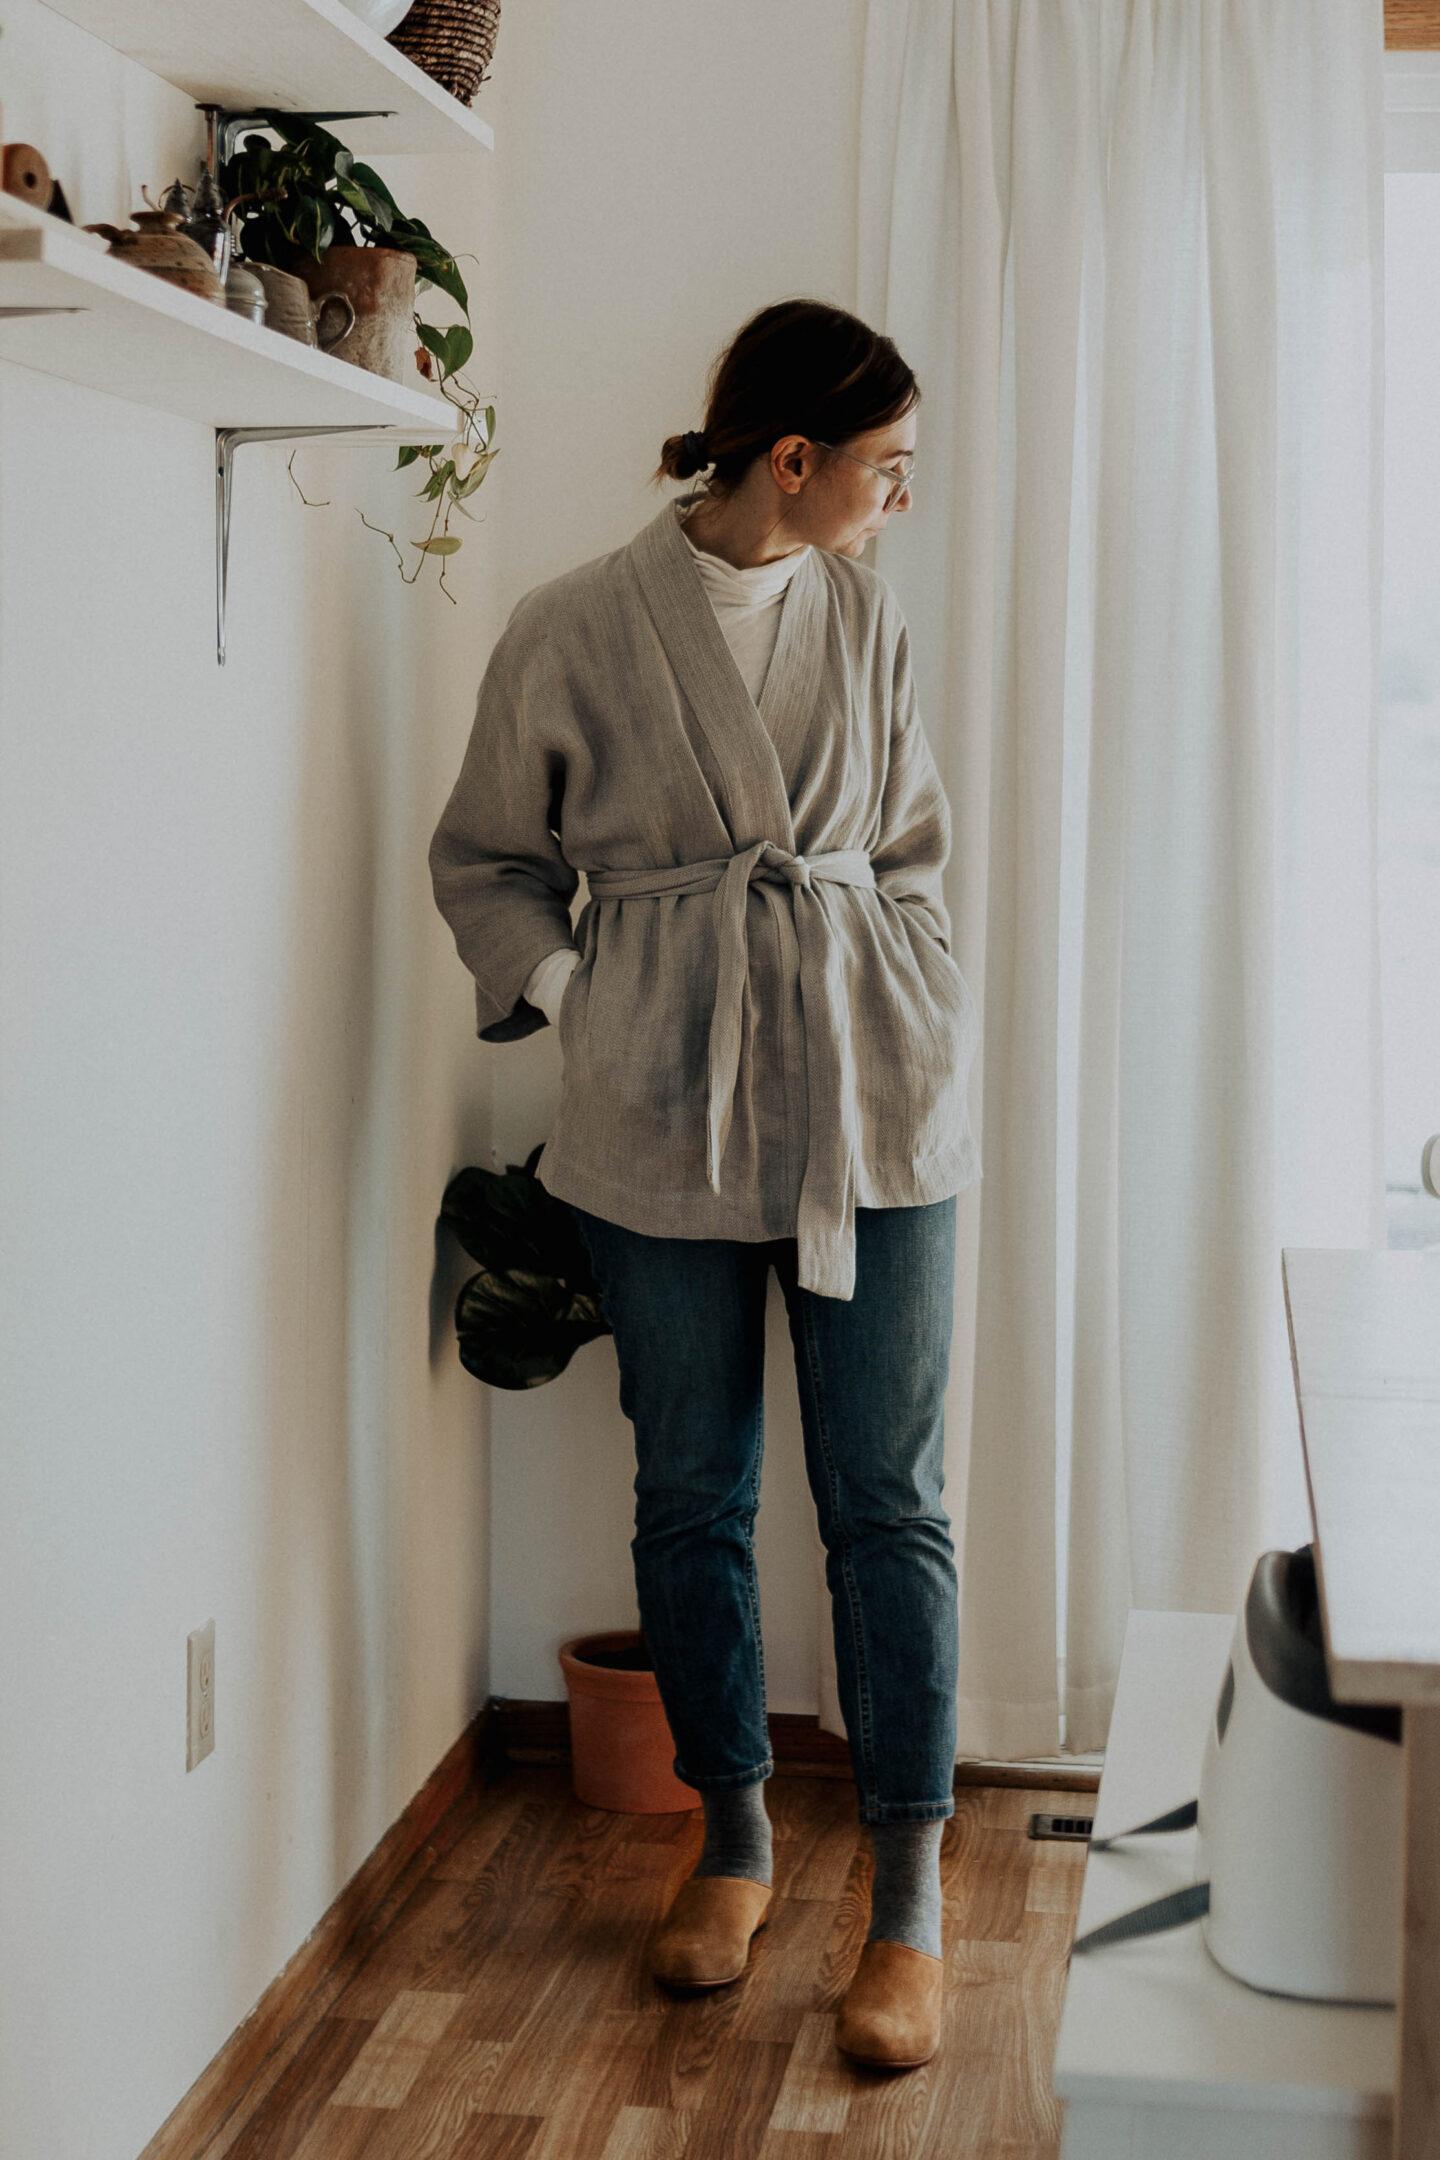 A Week of Outfits + Weekly Favorites